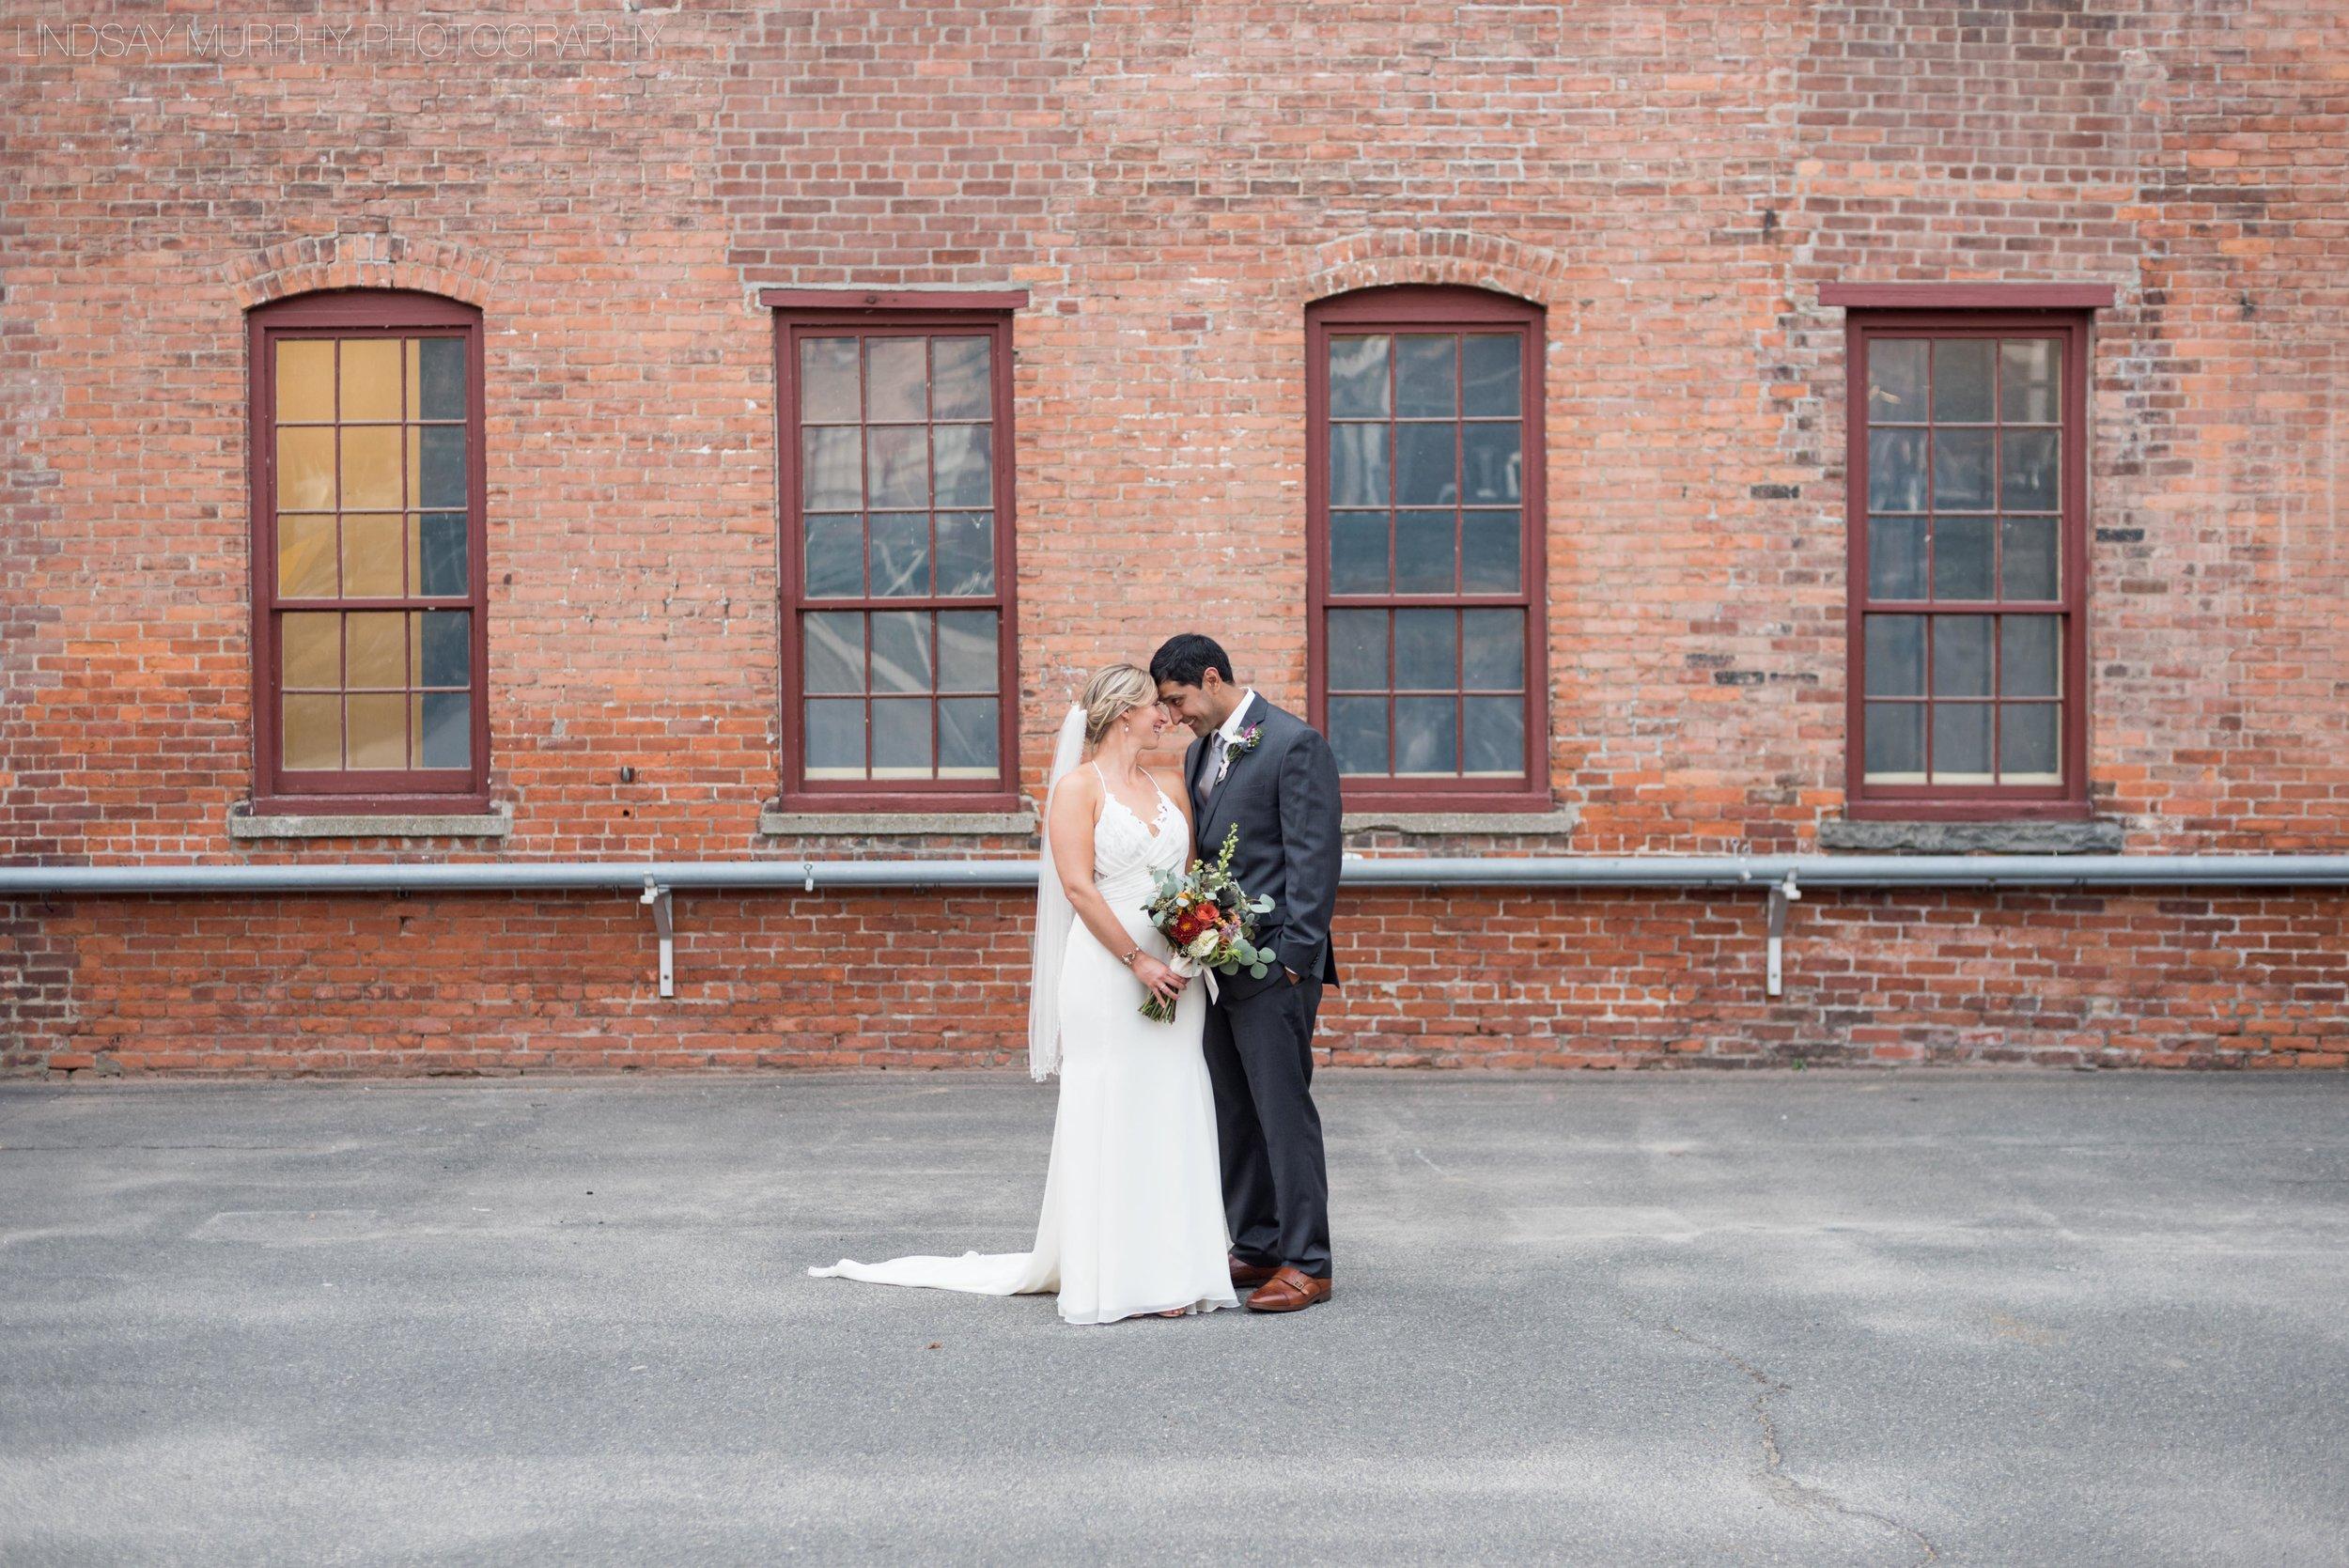 New_England_wedding-32.jpg